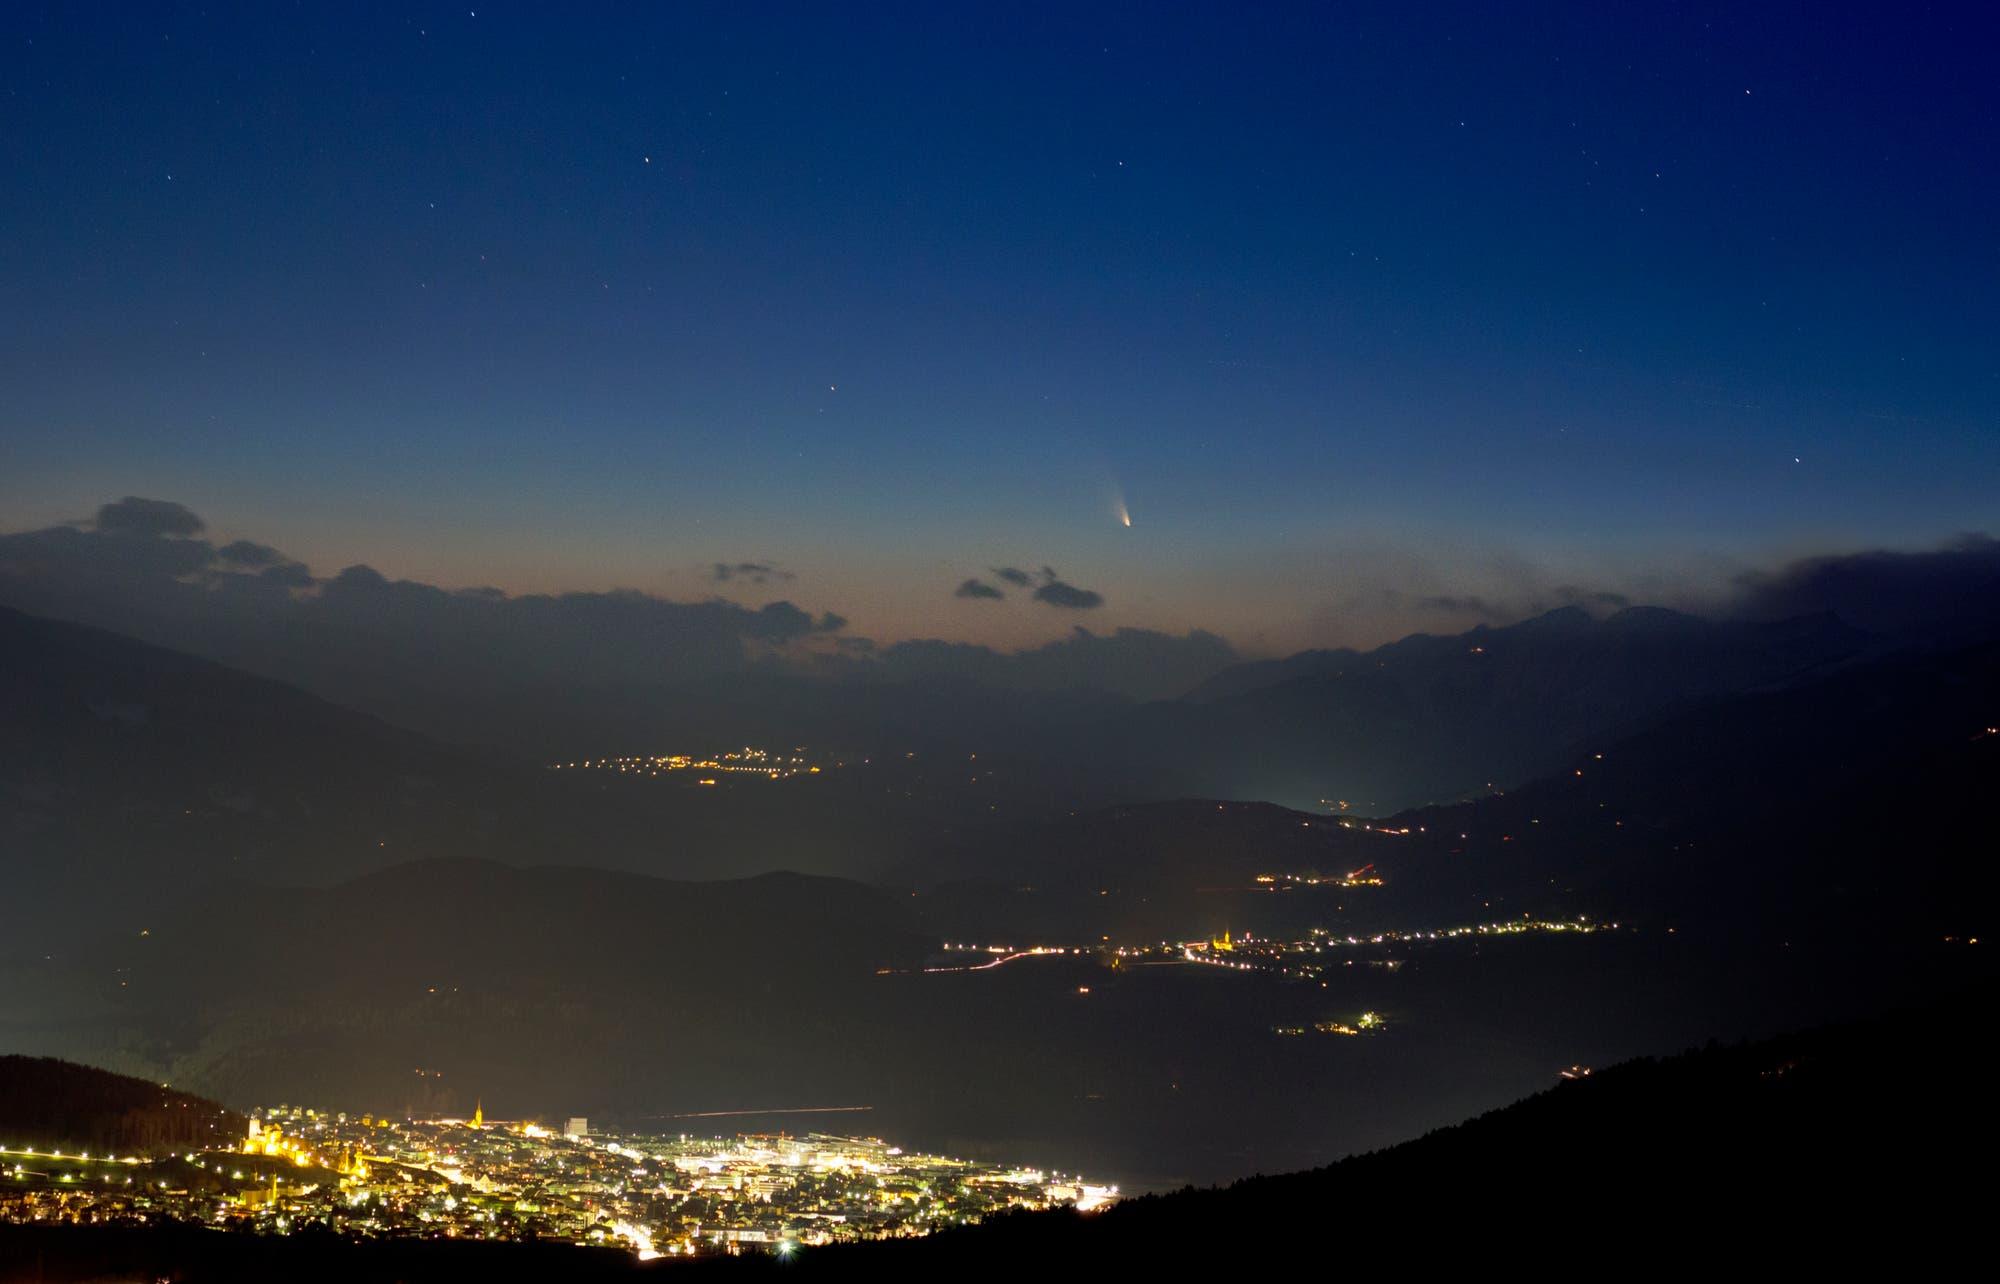 Komet PANSTARRS über Bruneck